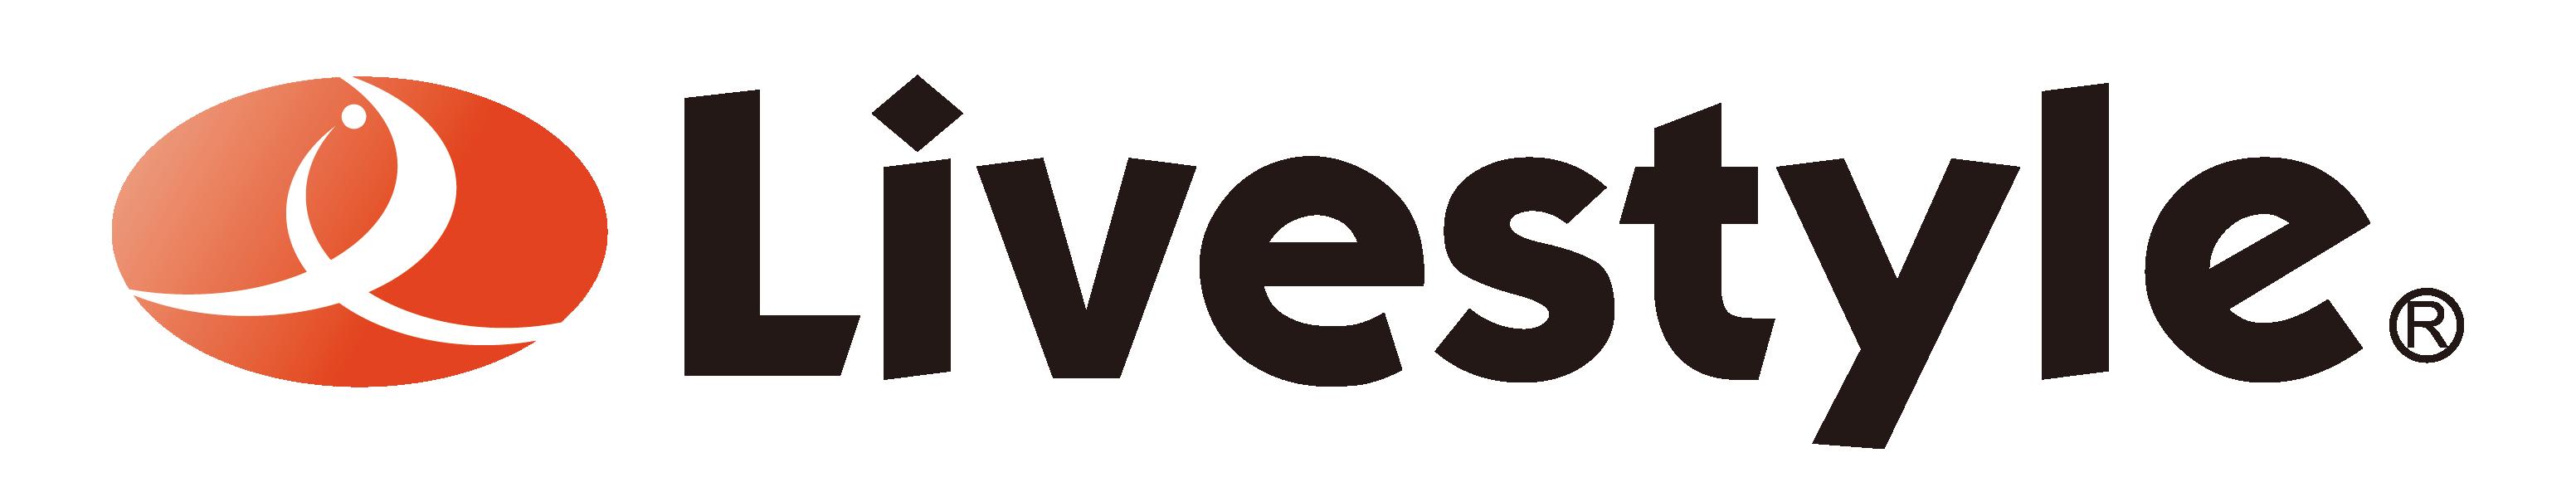 Livestyleロゴ